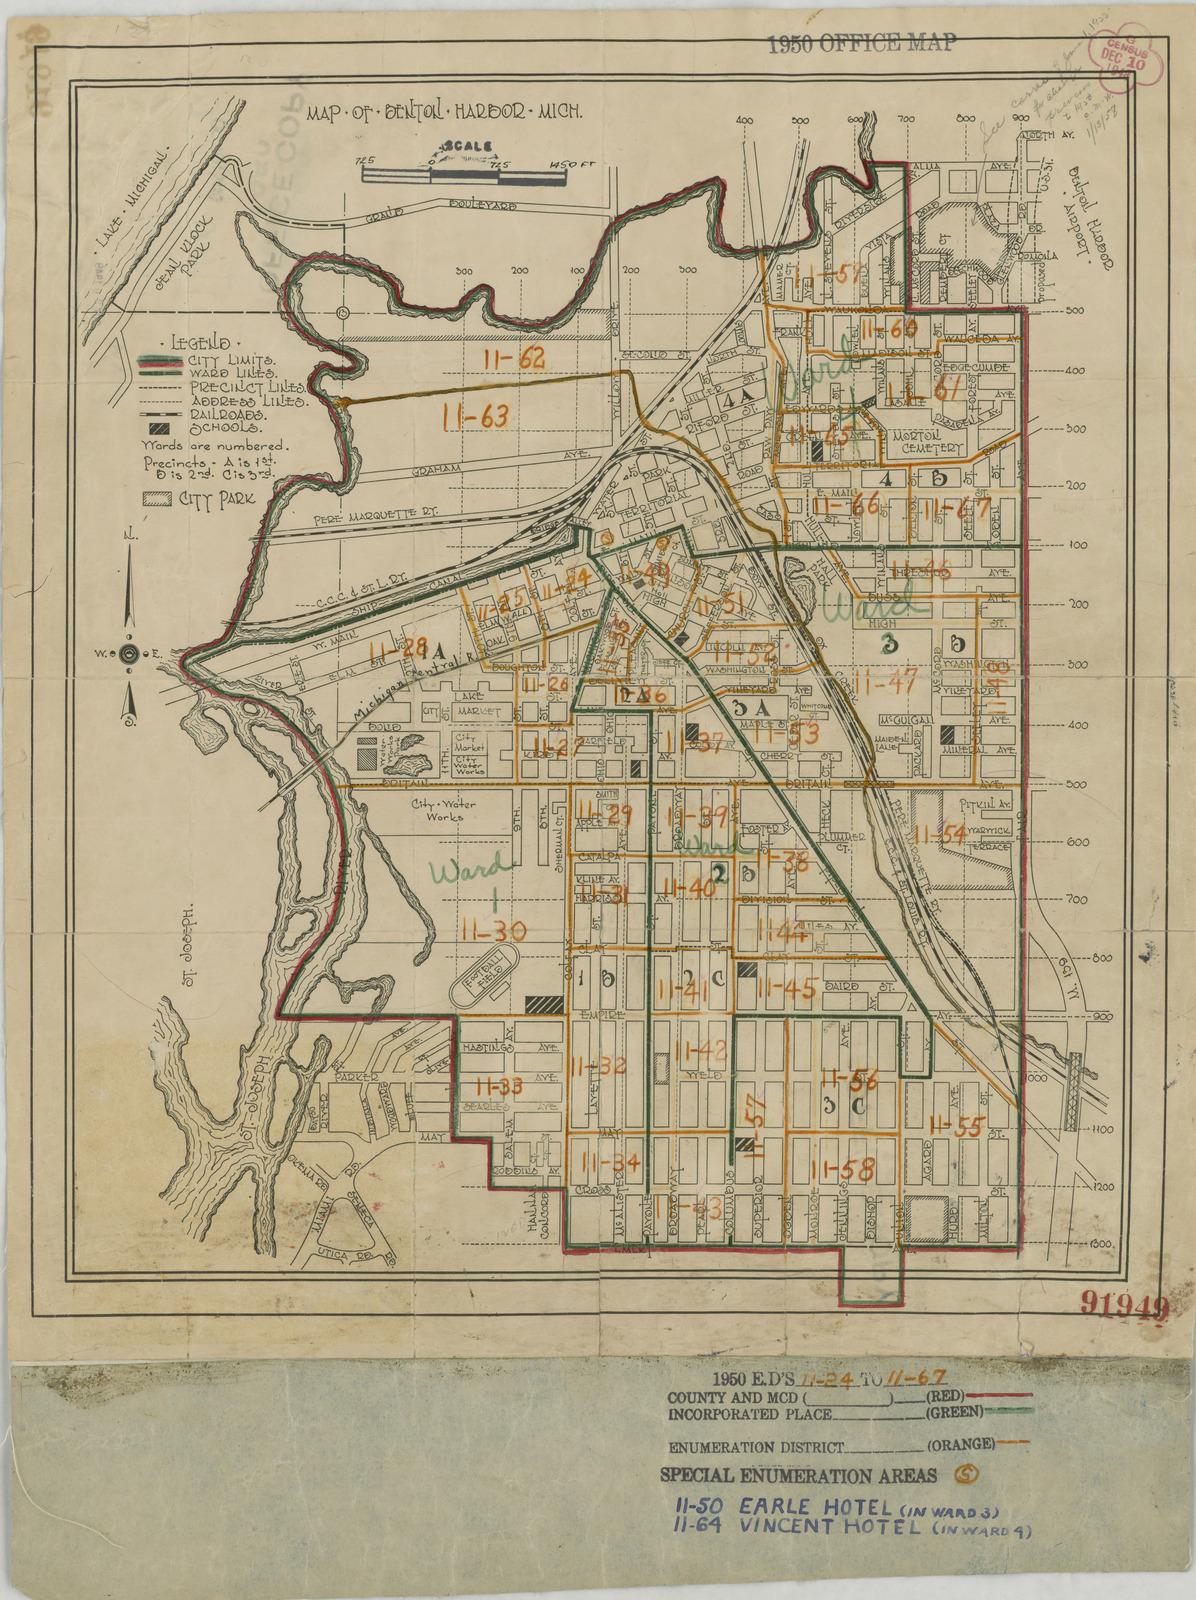 1950 Census Enumeration District Maps - Michigan (MI) - Berrien County - Benton Harbor - ED 11-24 to 67